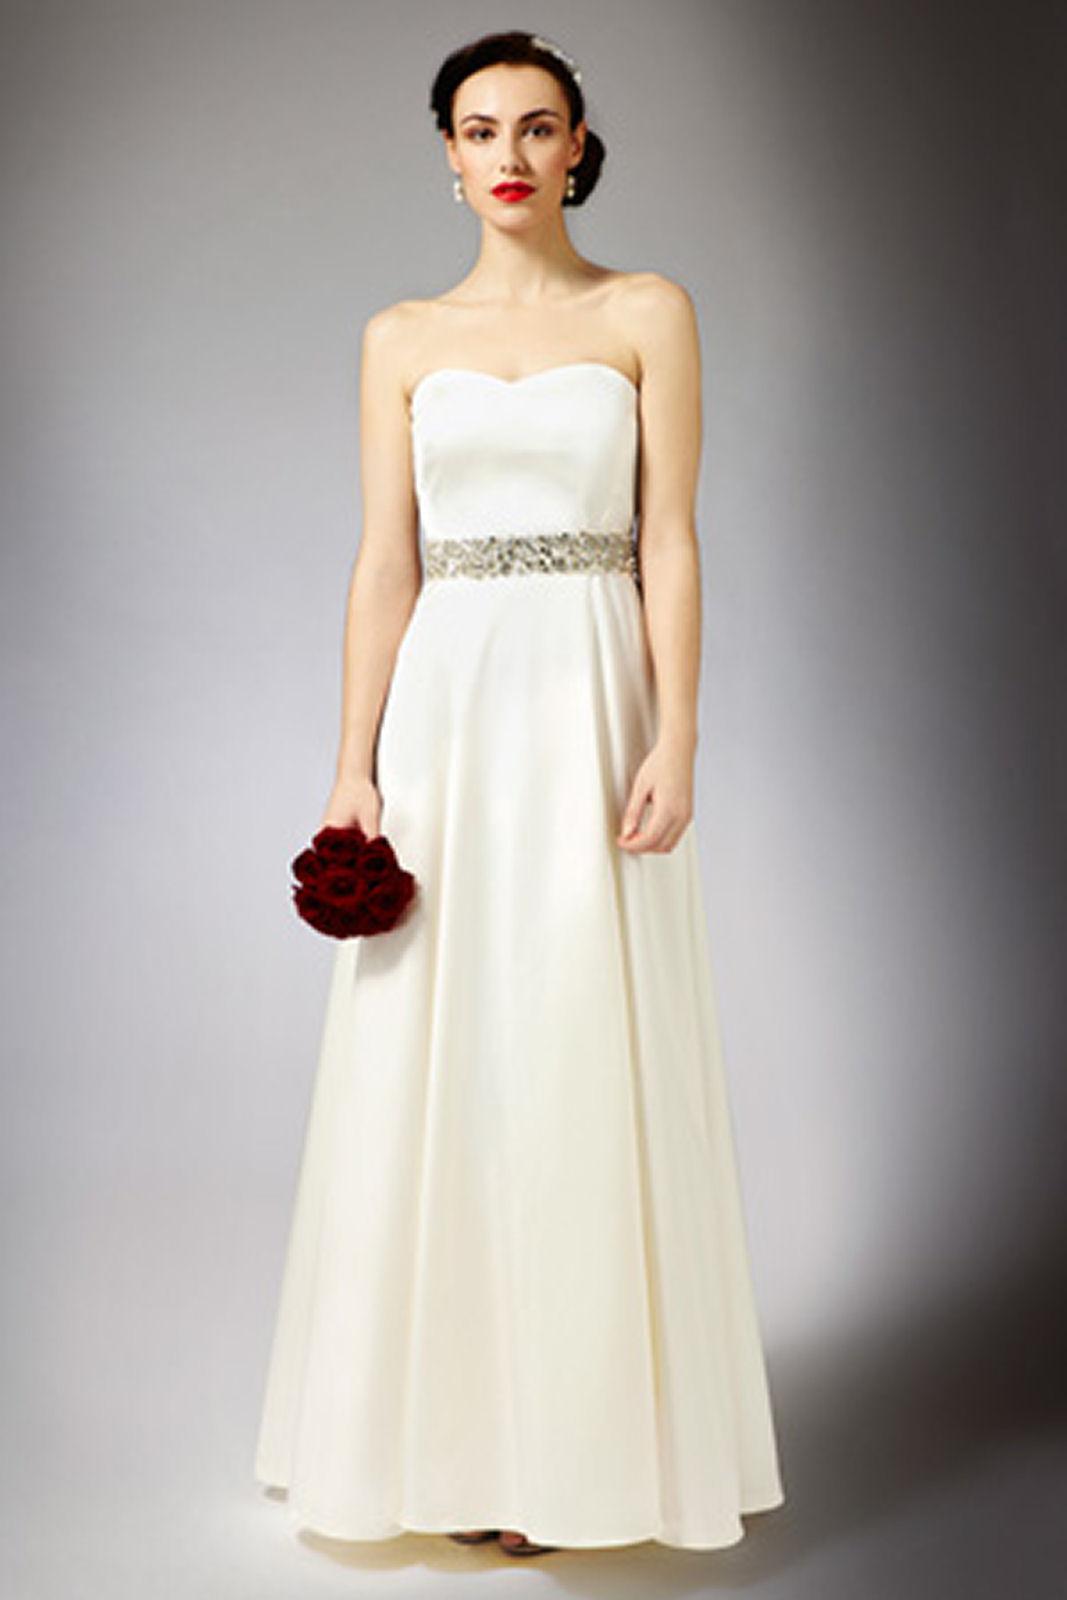 coast wedding dresses photo - 1